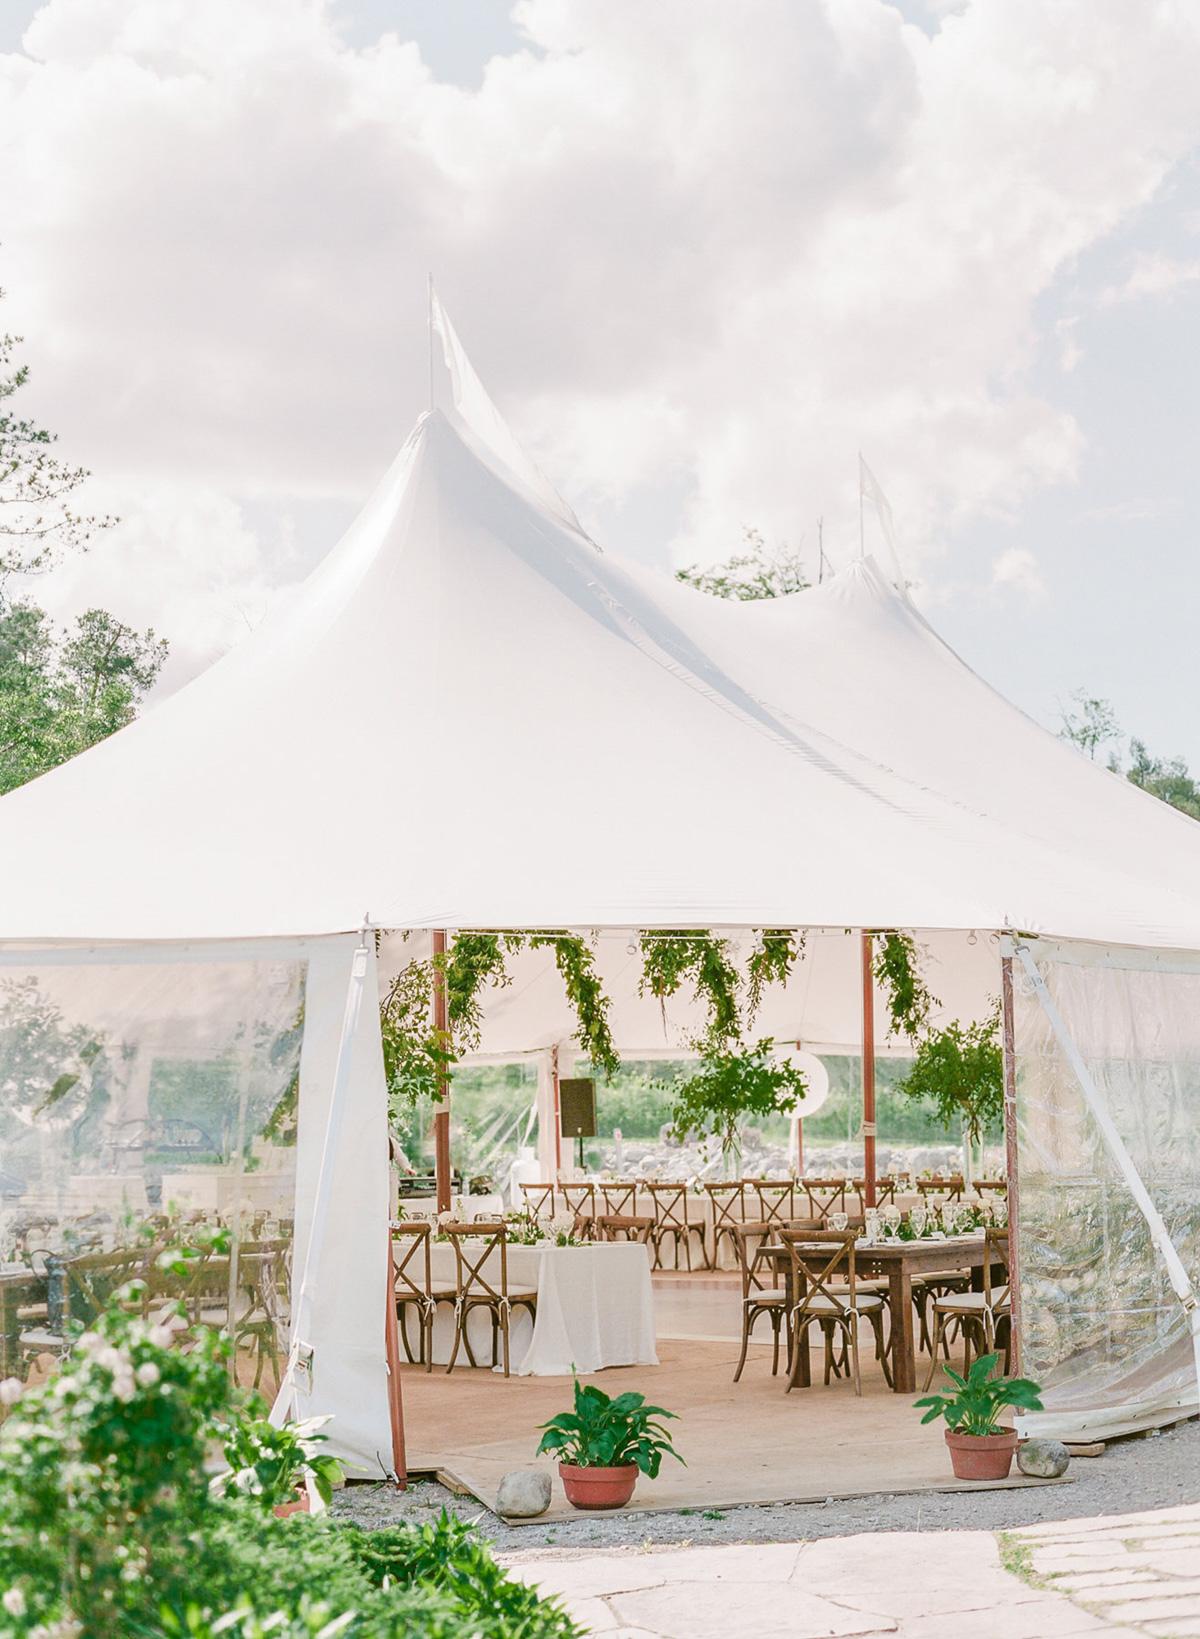 artiese-studios-vineyard-bride-swish-list-private-estate-cambridge-wedding-33.jpg